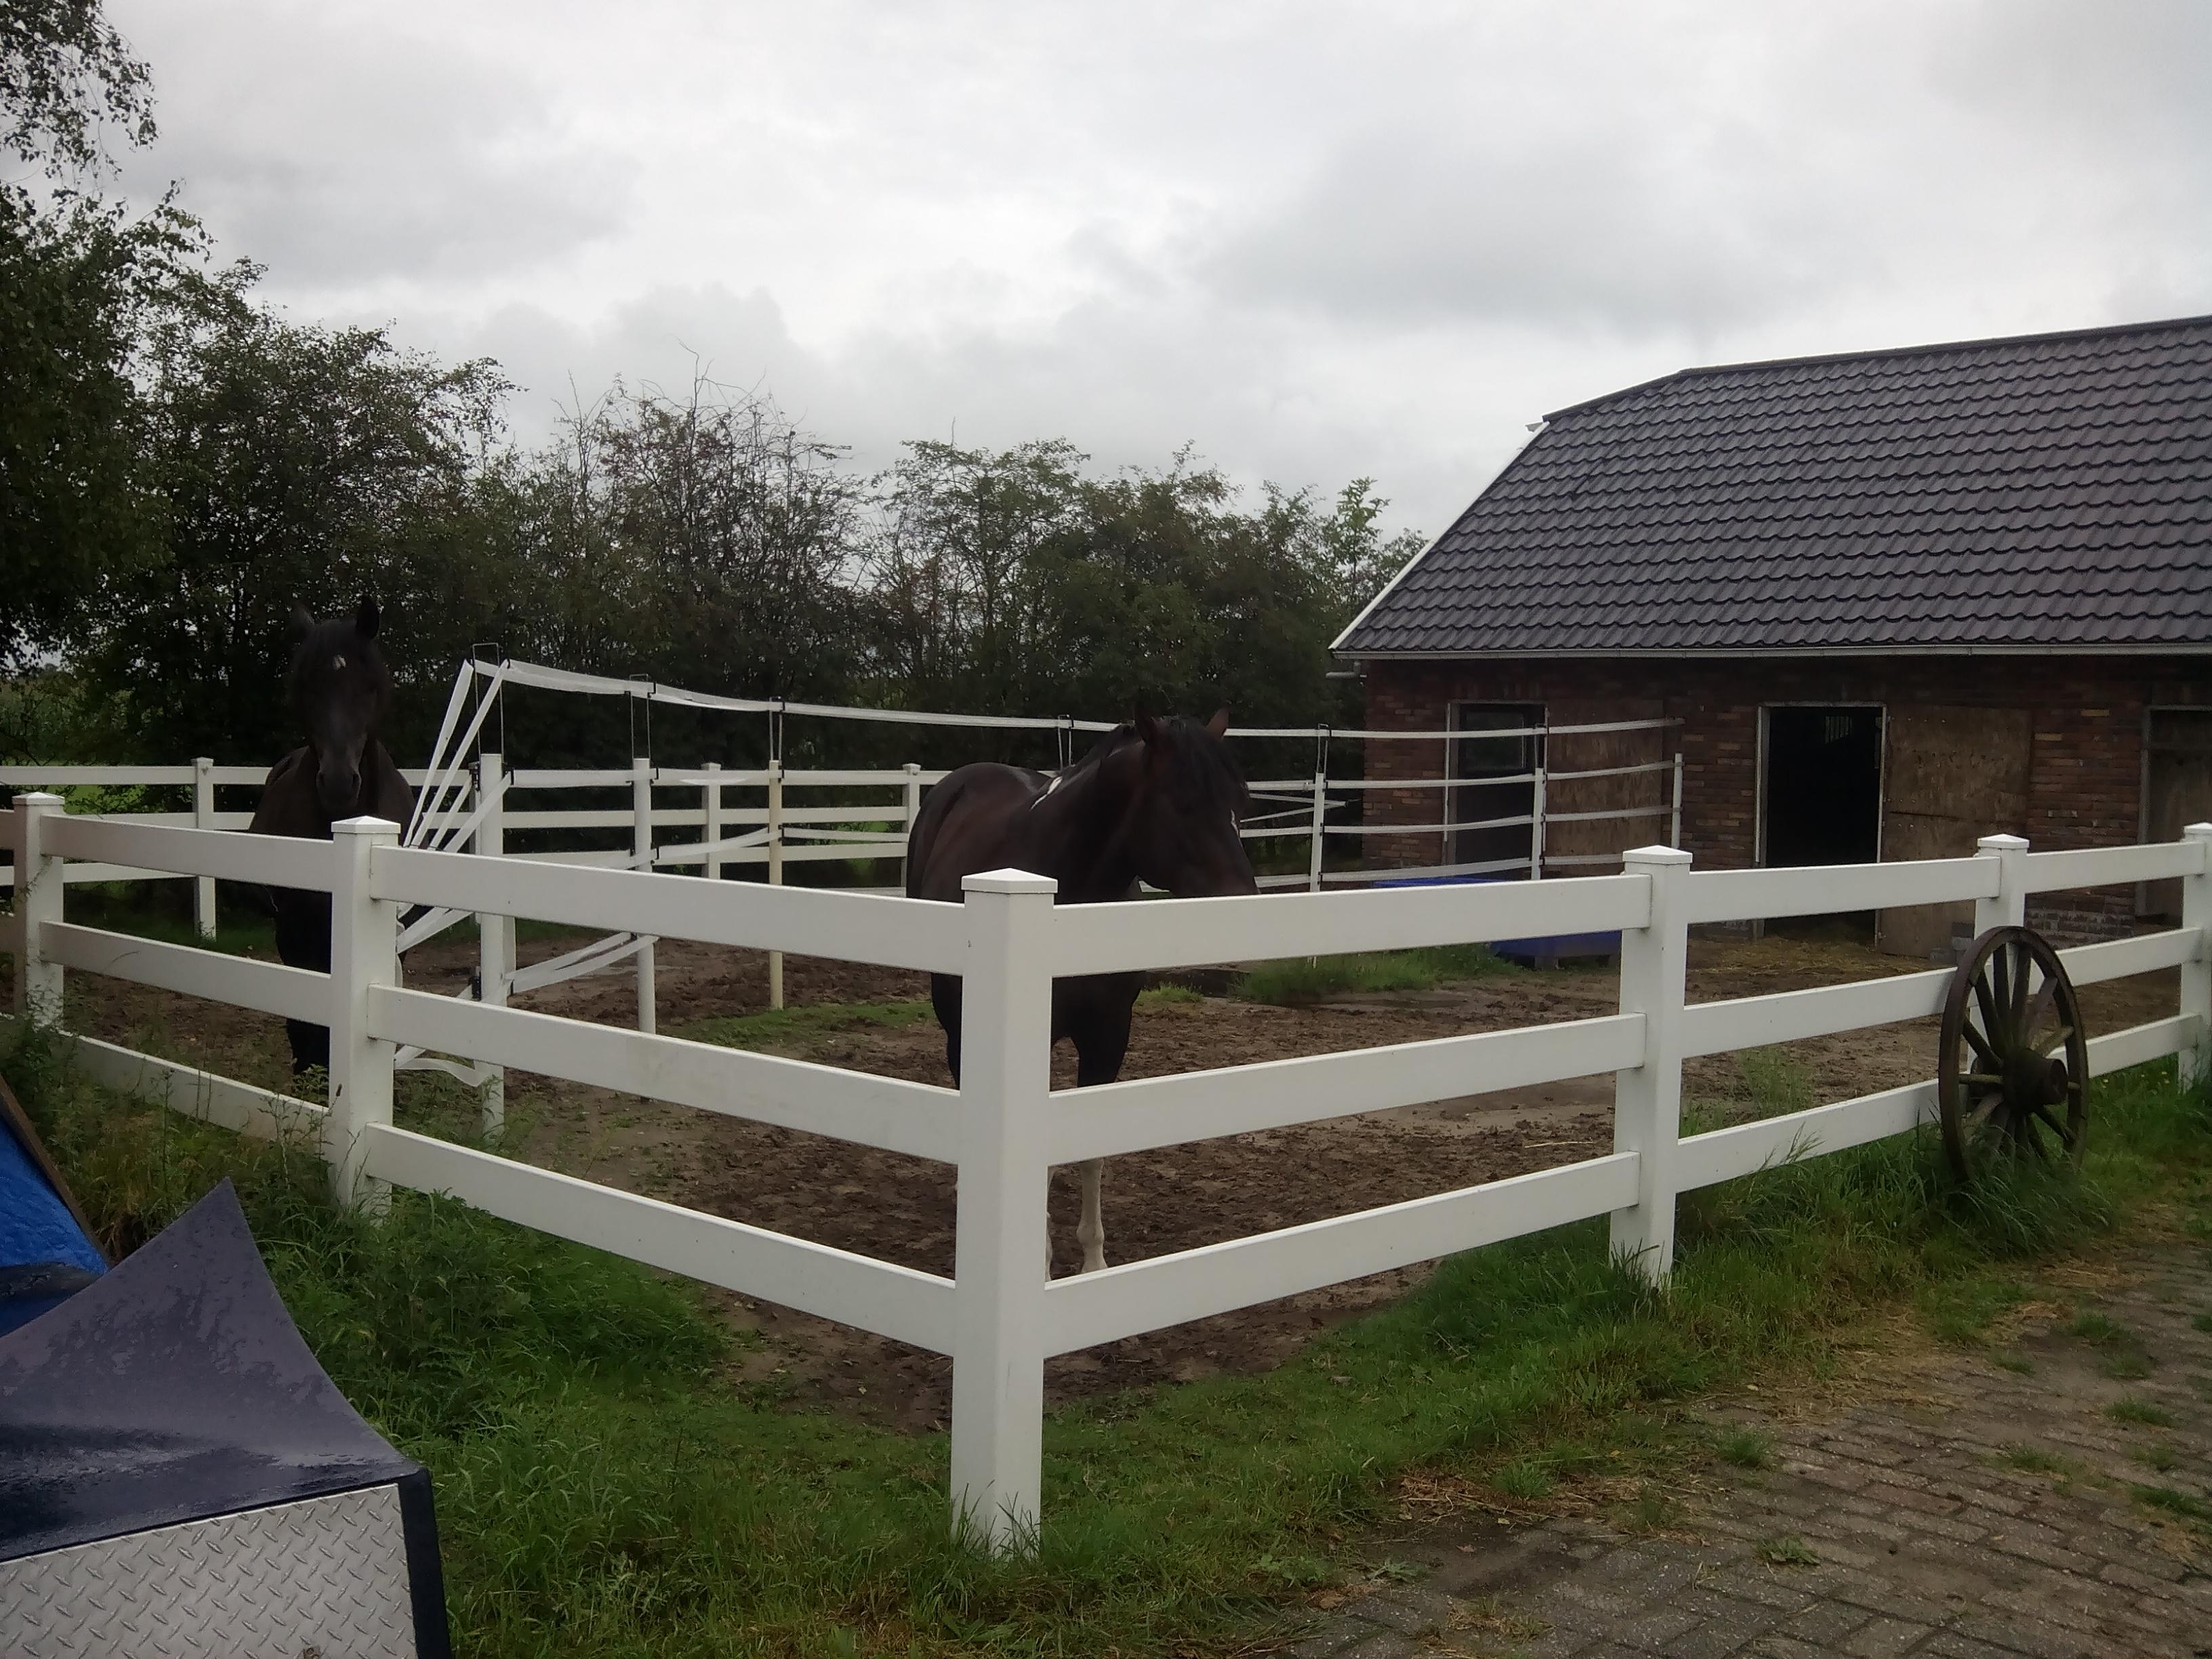 woning met paardenstallen rijbak weiland paddocks